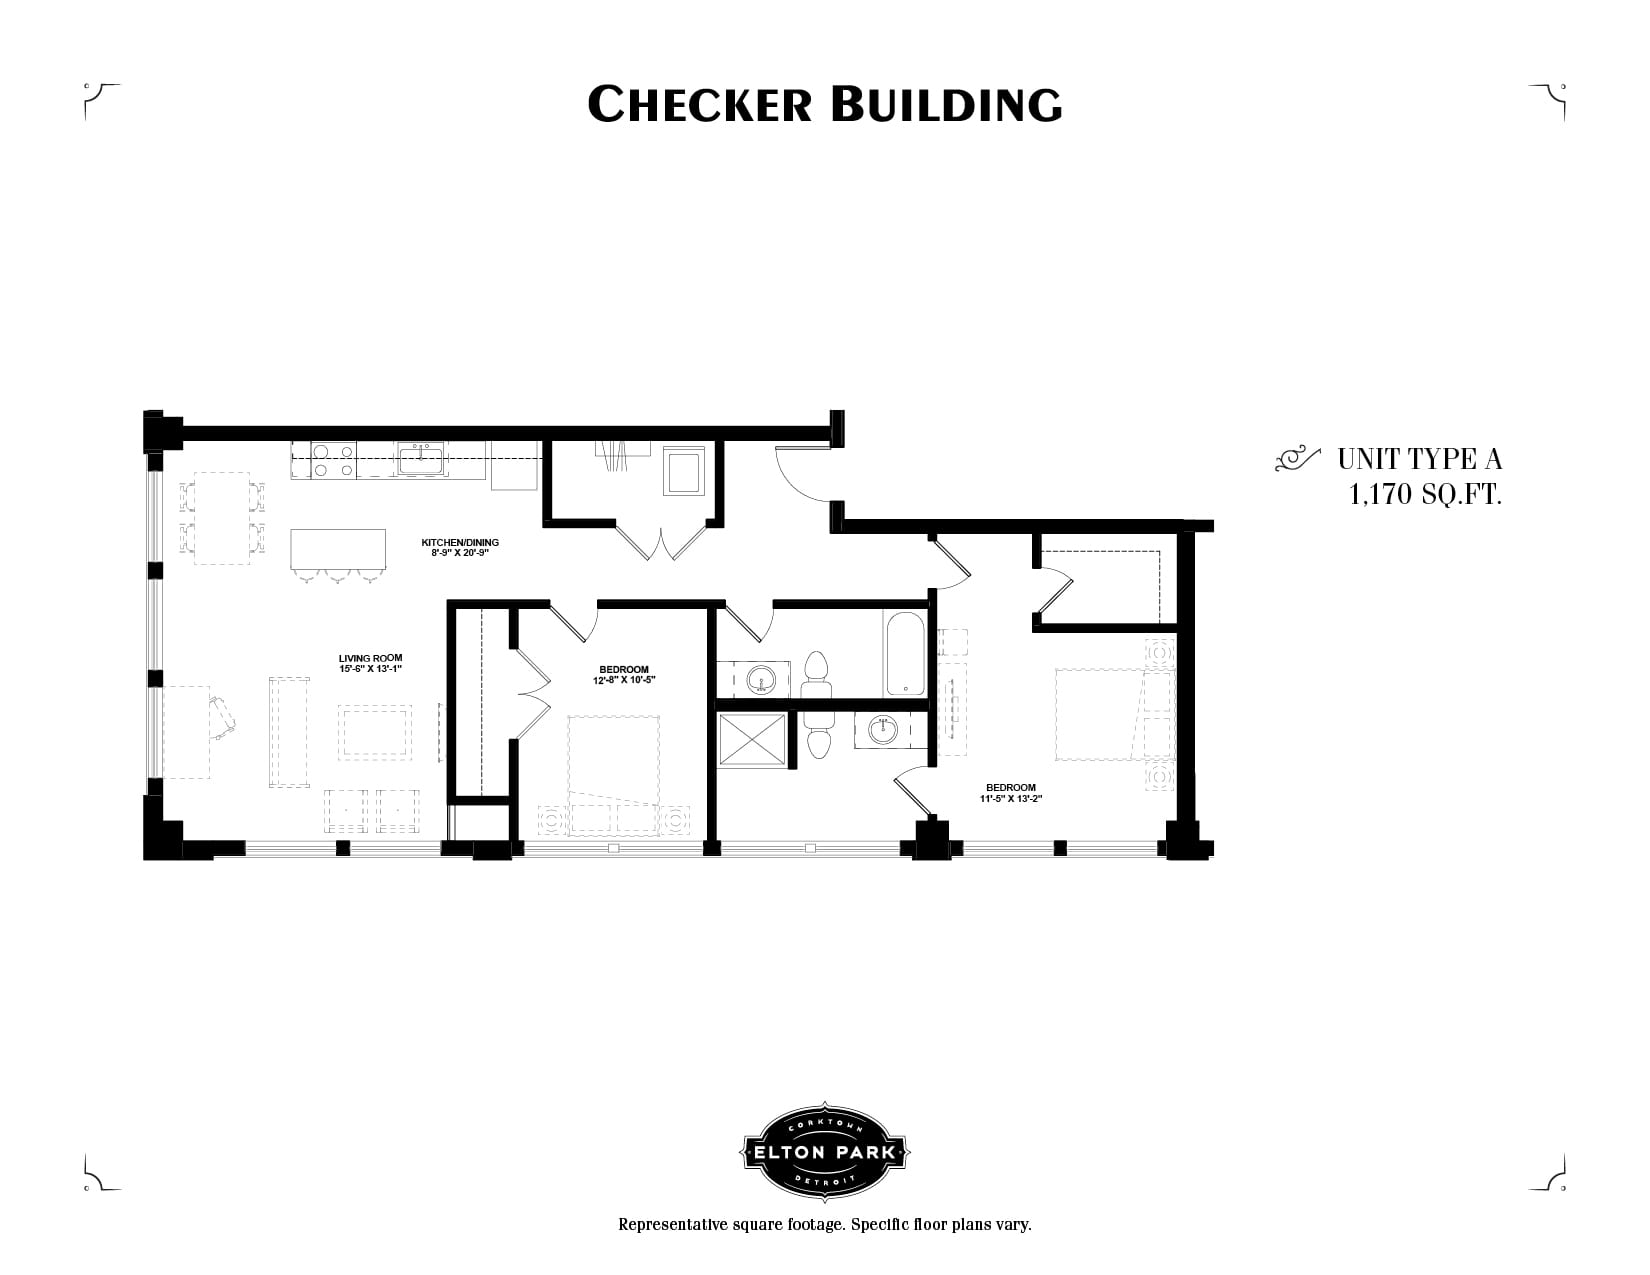 Checker Building Unit Type A